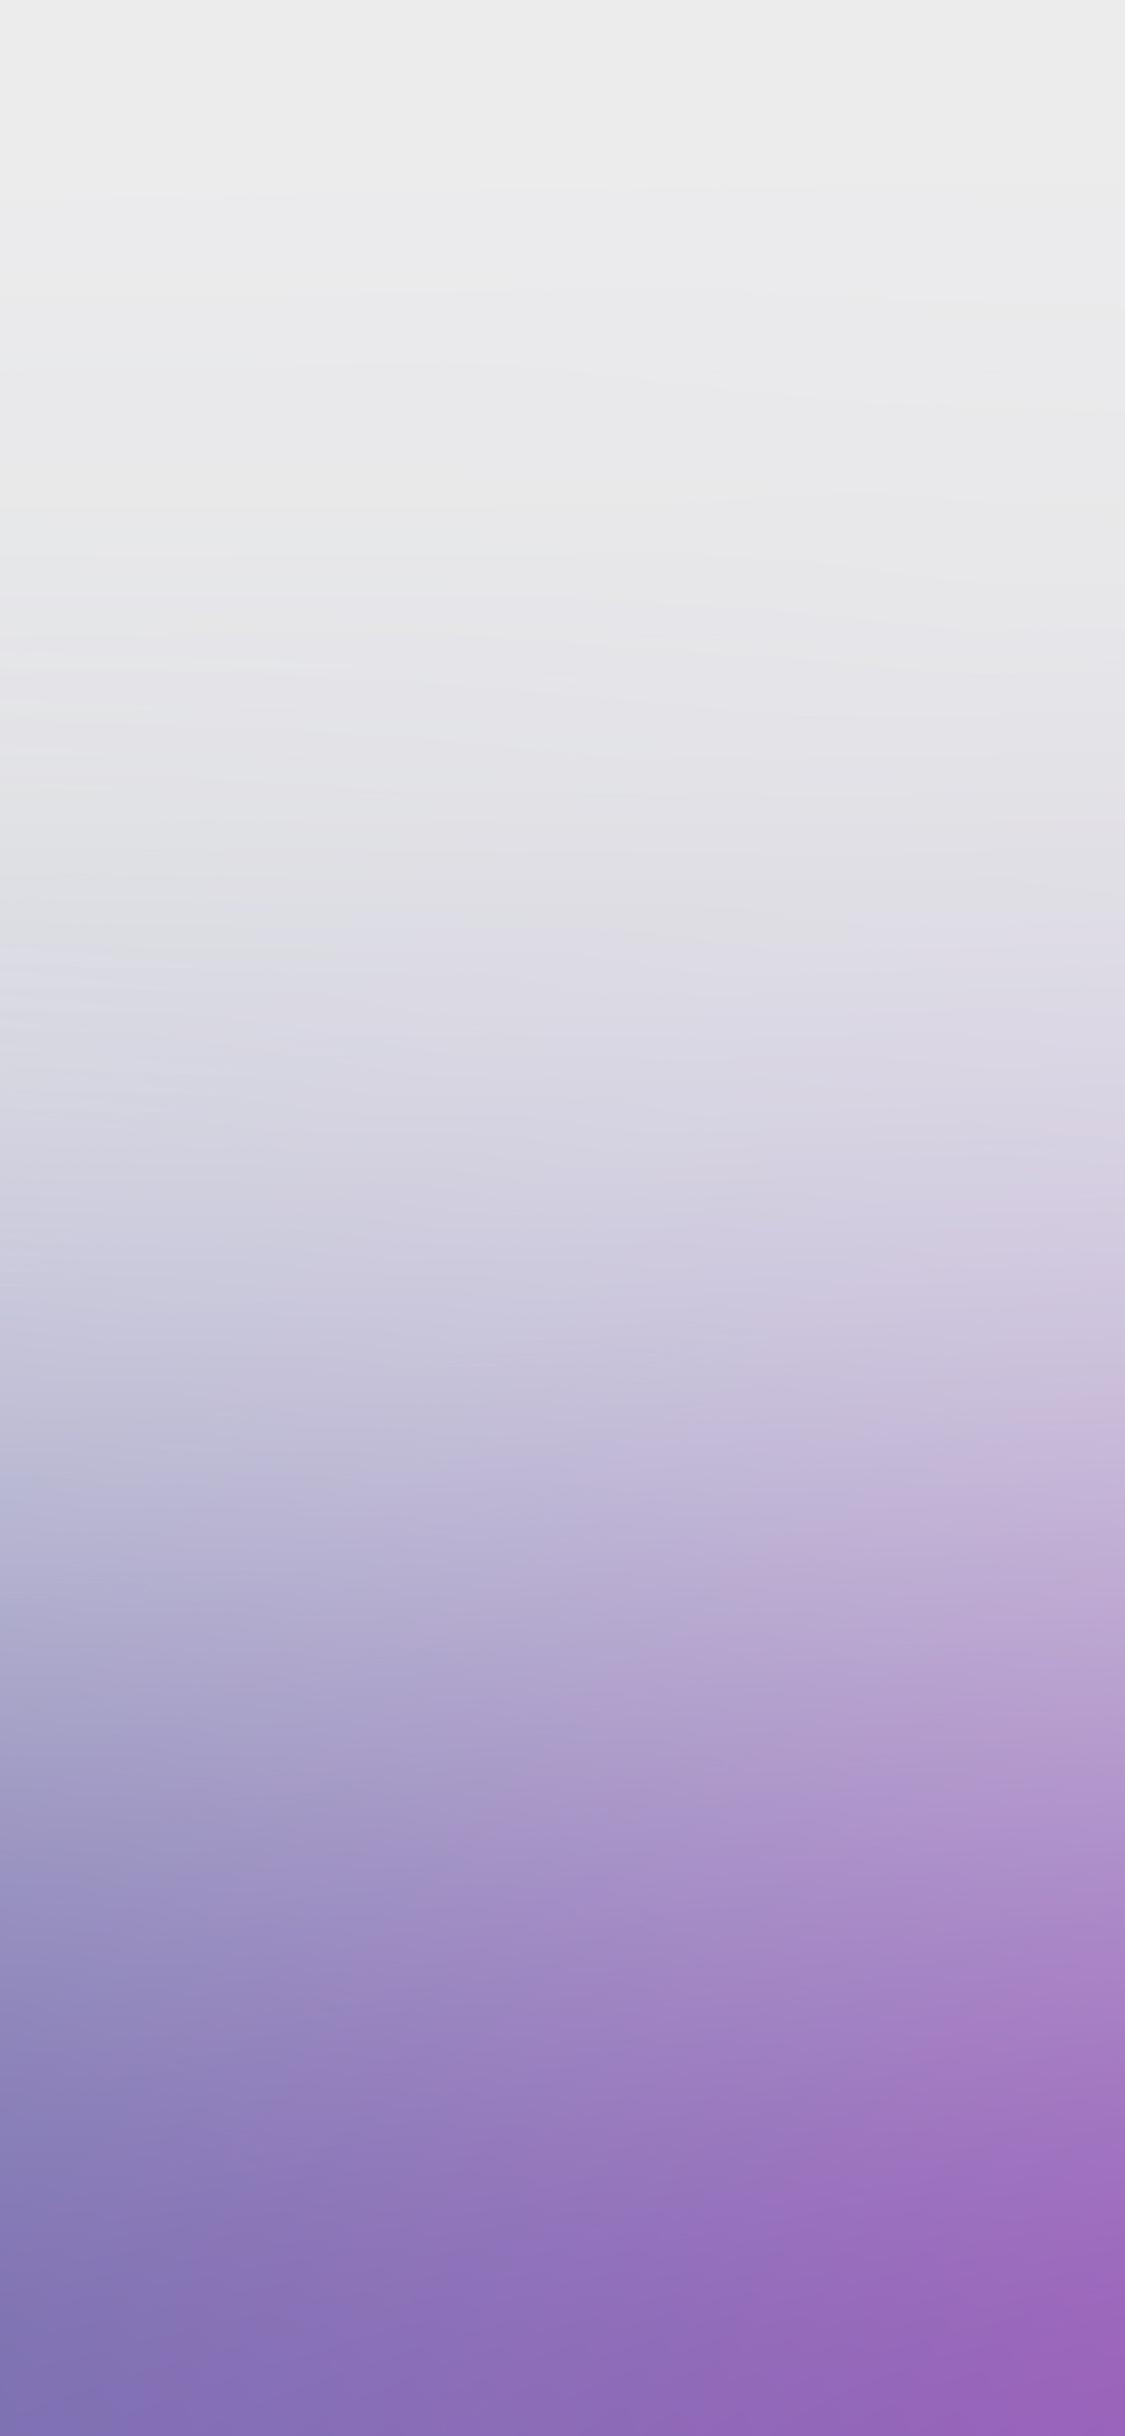 iPhoneXpapers.com-Apple-iPhone-wallpaper-sf63-white-purple-gradation-blur